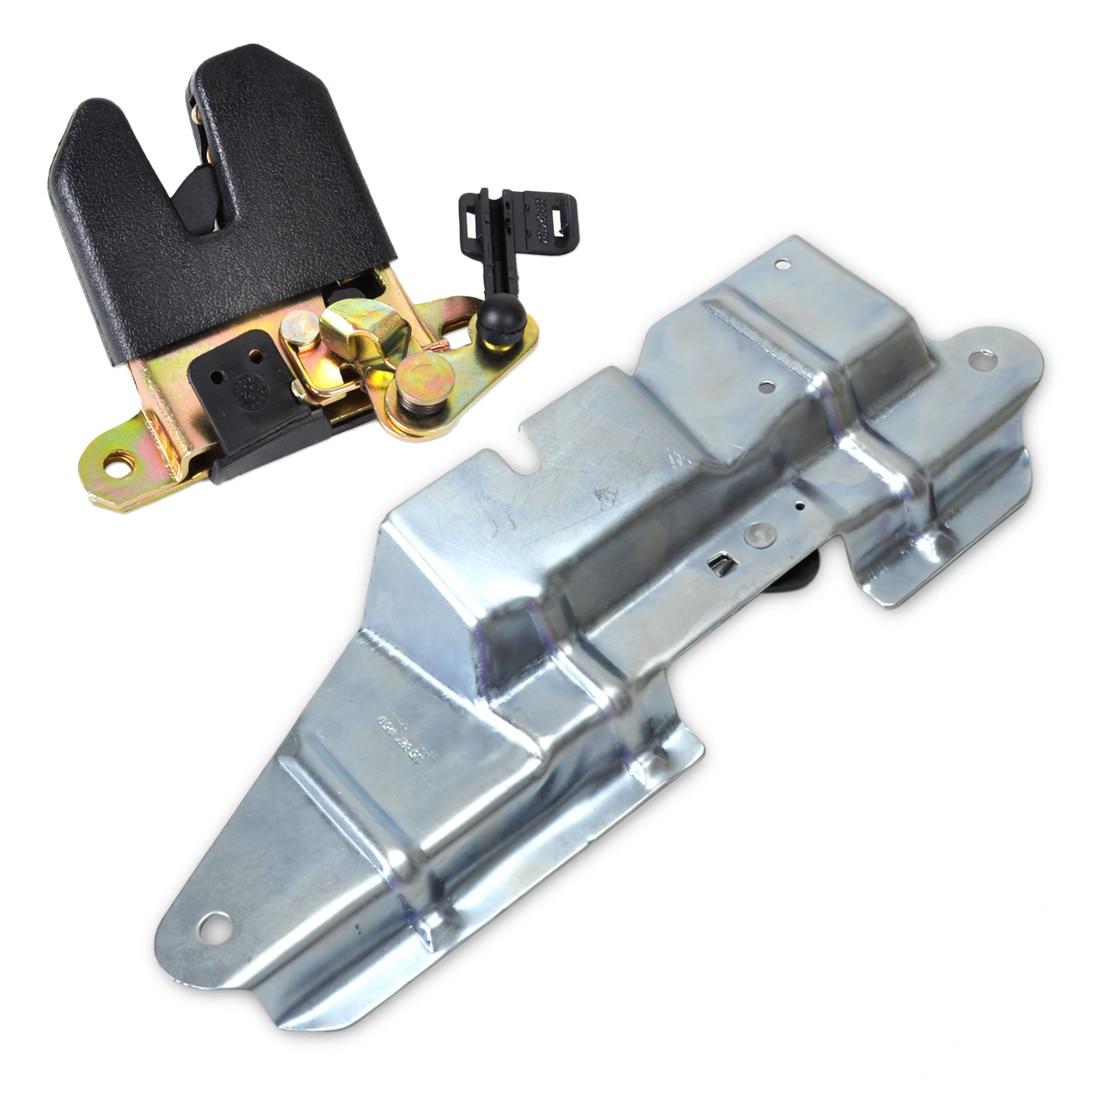 DWCX Rear Trunk Boot Lid Latch Lock Actuator Bracket Mount Set 1J5827505 1J5827425F 1J5827505H01C For VW Jetta Bora 1999 - 2004